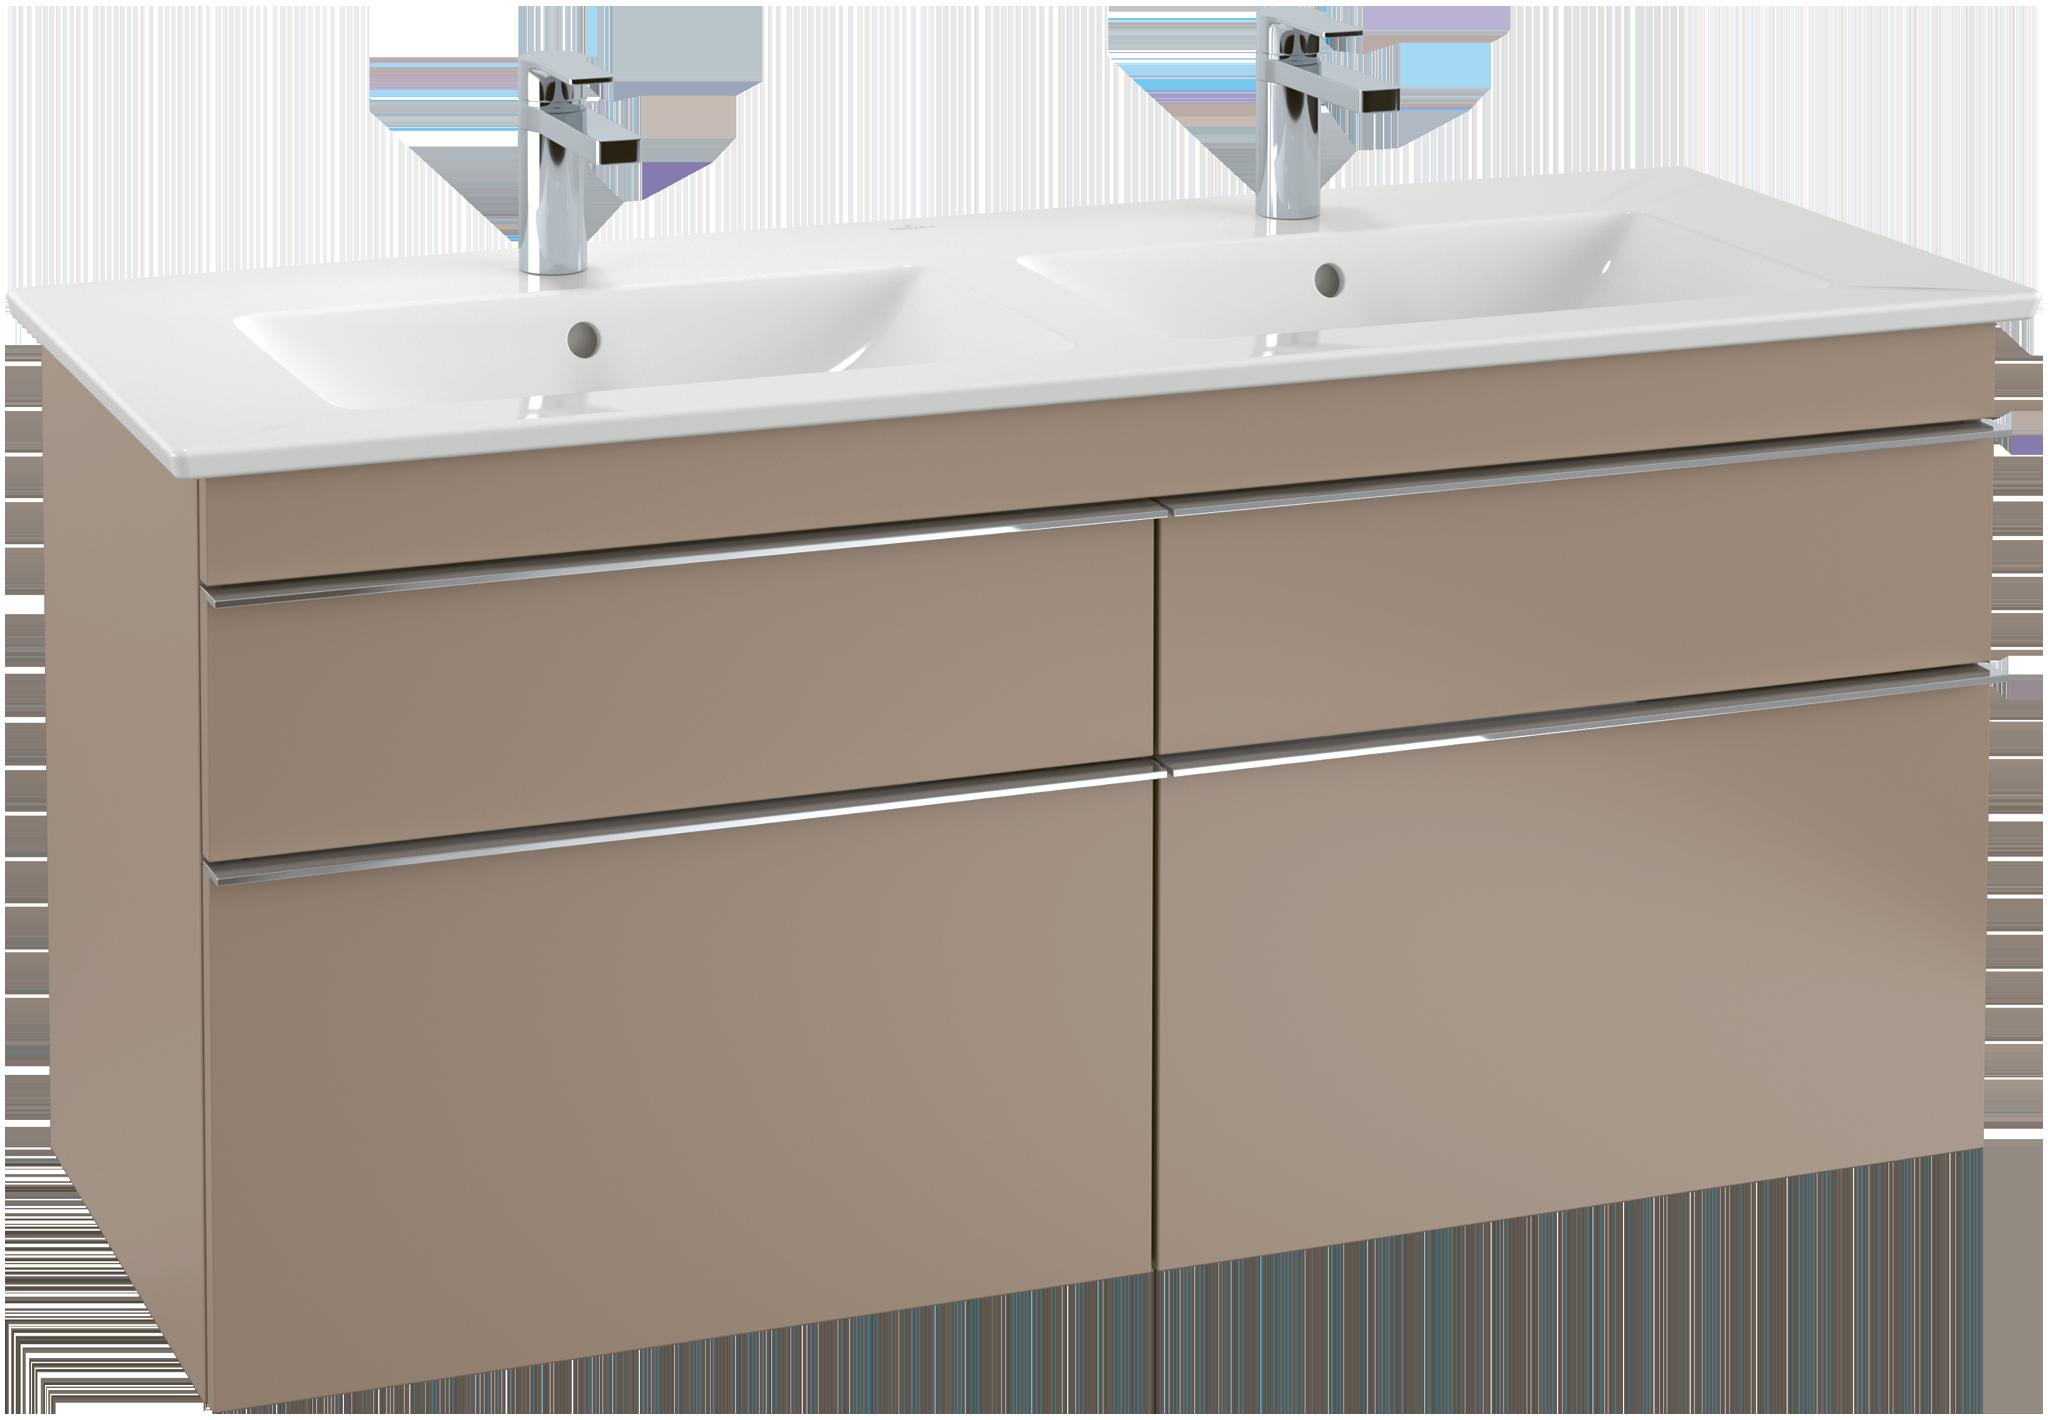 venticello waschtischunterschrank a93003 villeroy boch. Black Bedroom Furniture Sets. Home Design Ideas